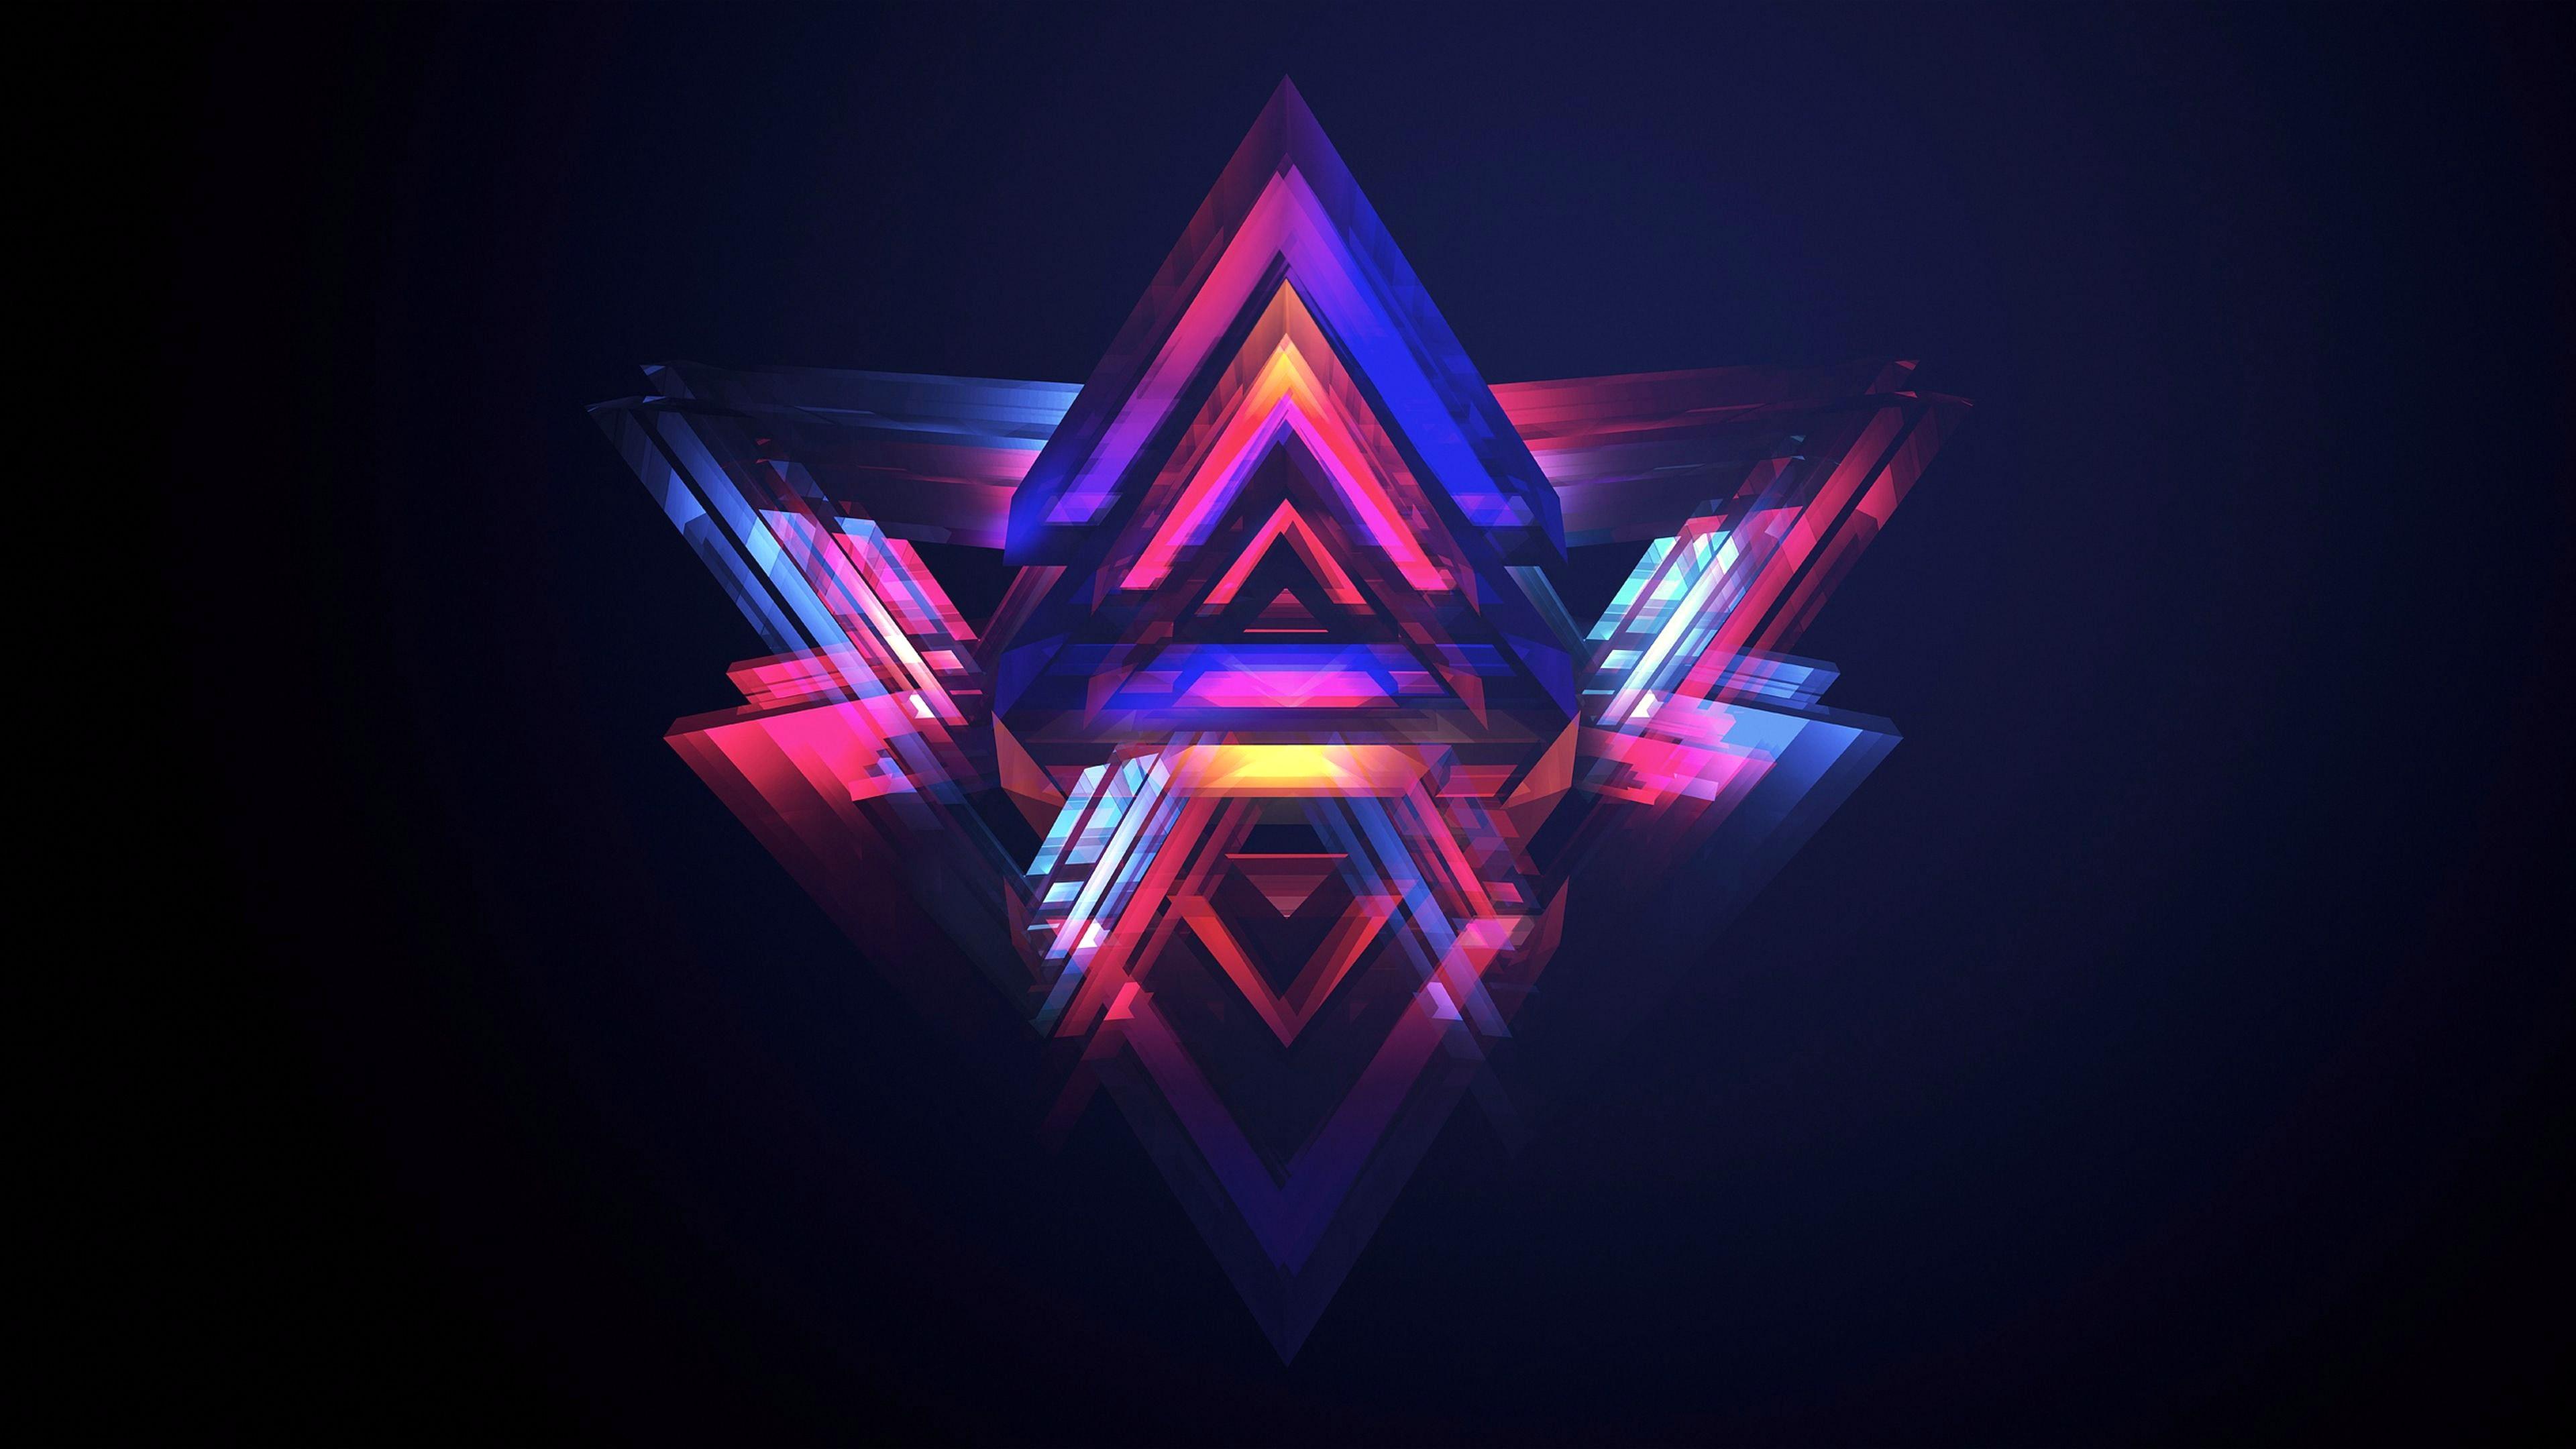 triangle background hd wallpaper - HD2133×1200